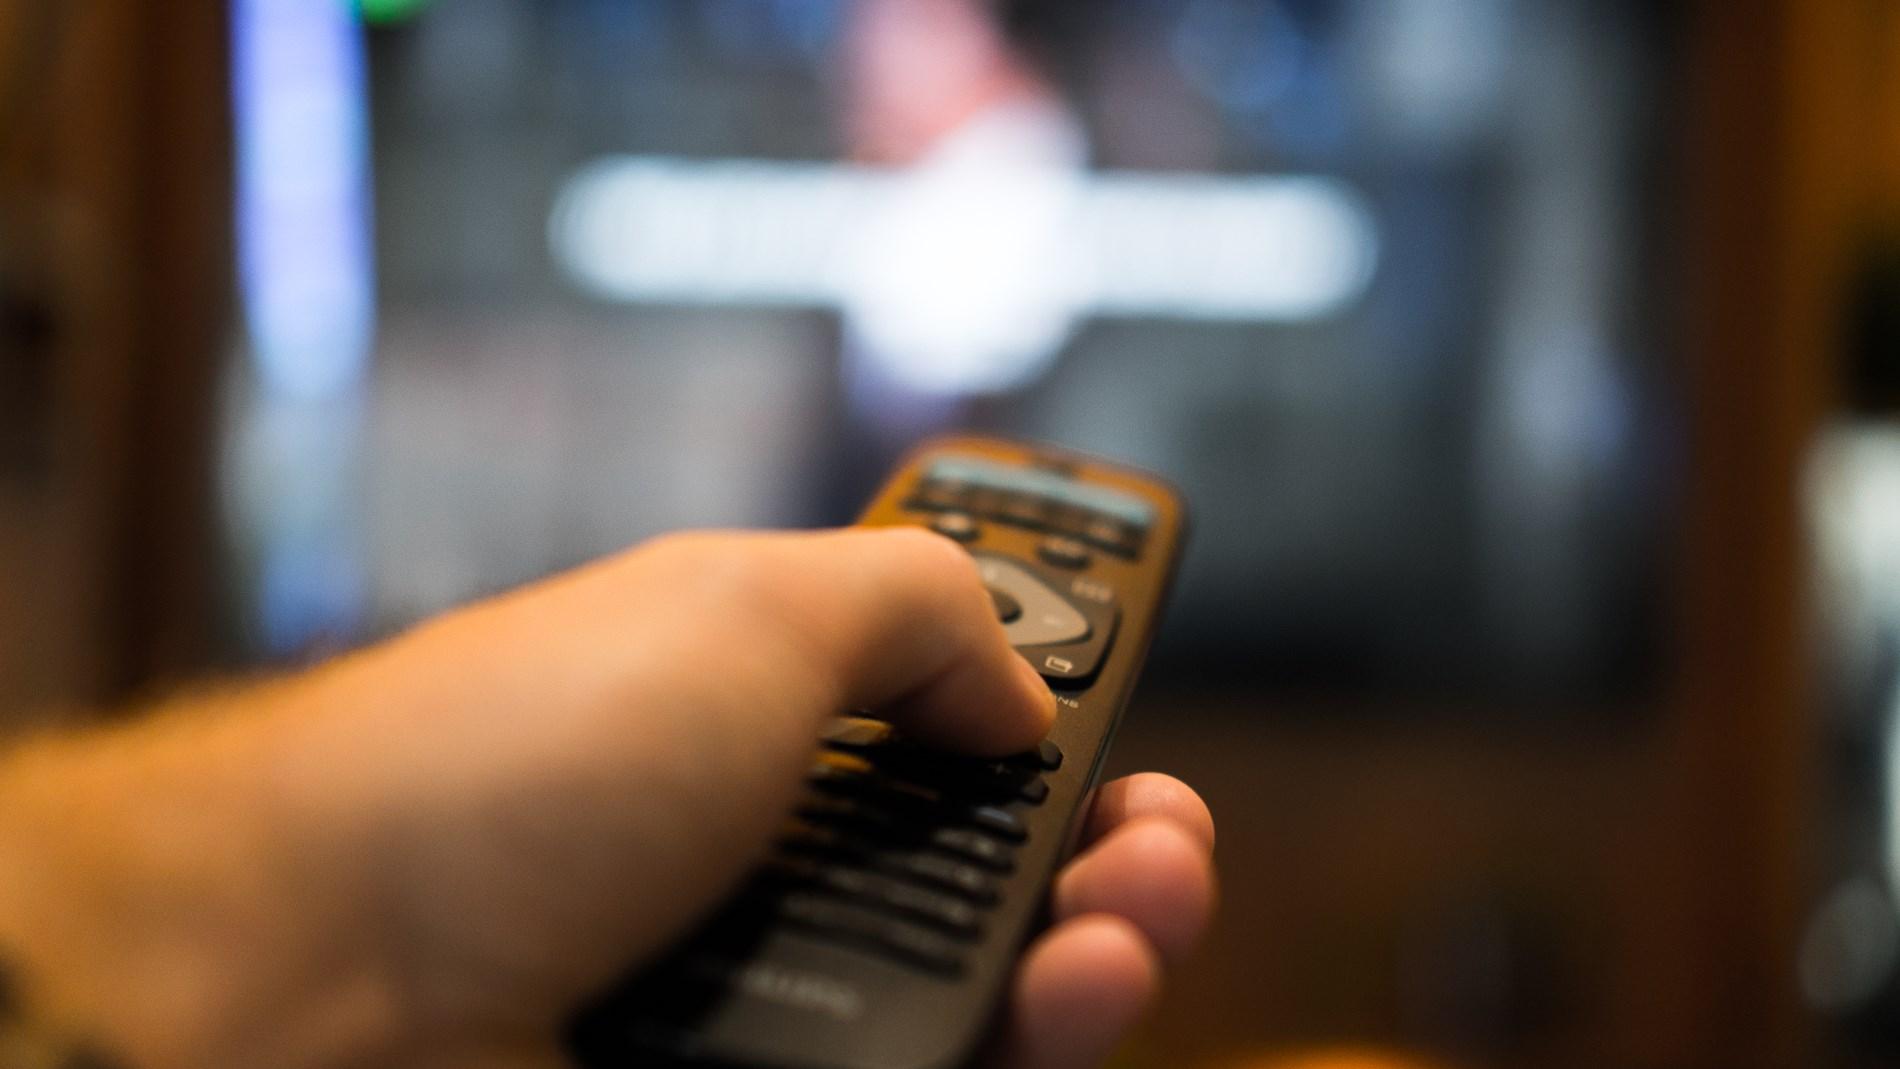 e9f56e6f5cf Aftaler om tv for offentlige institutioner | Copydan Verdens TV